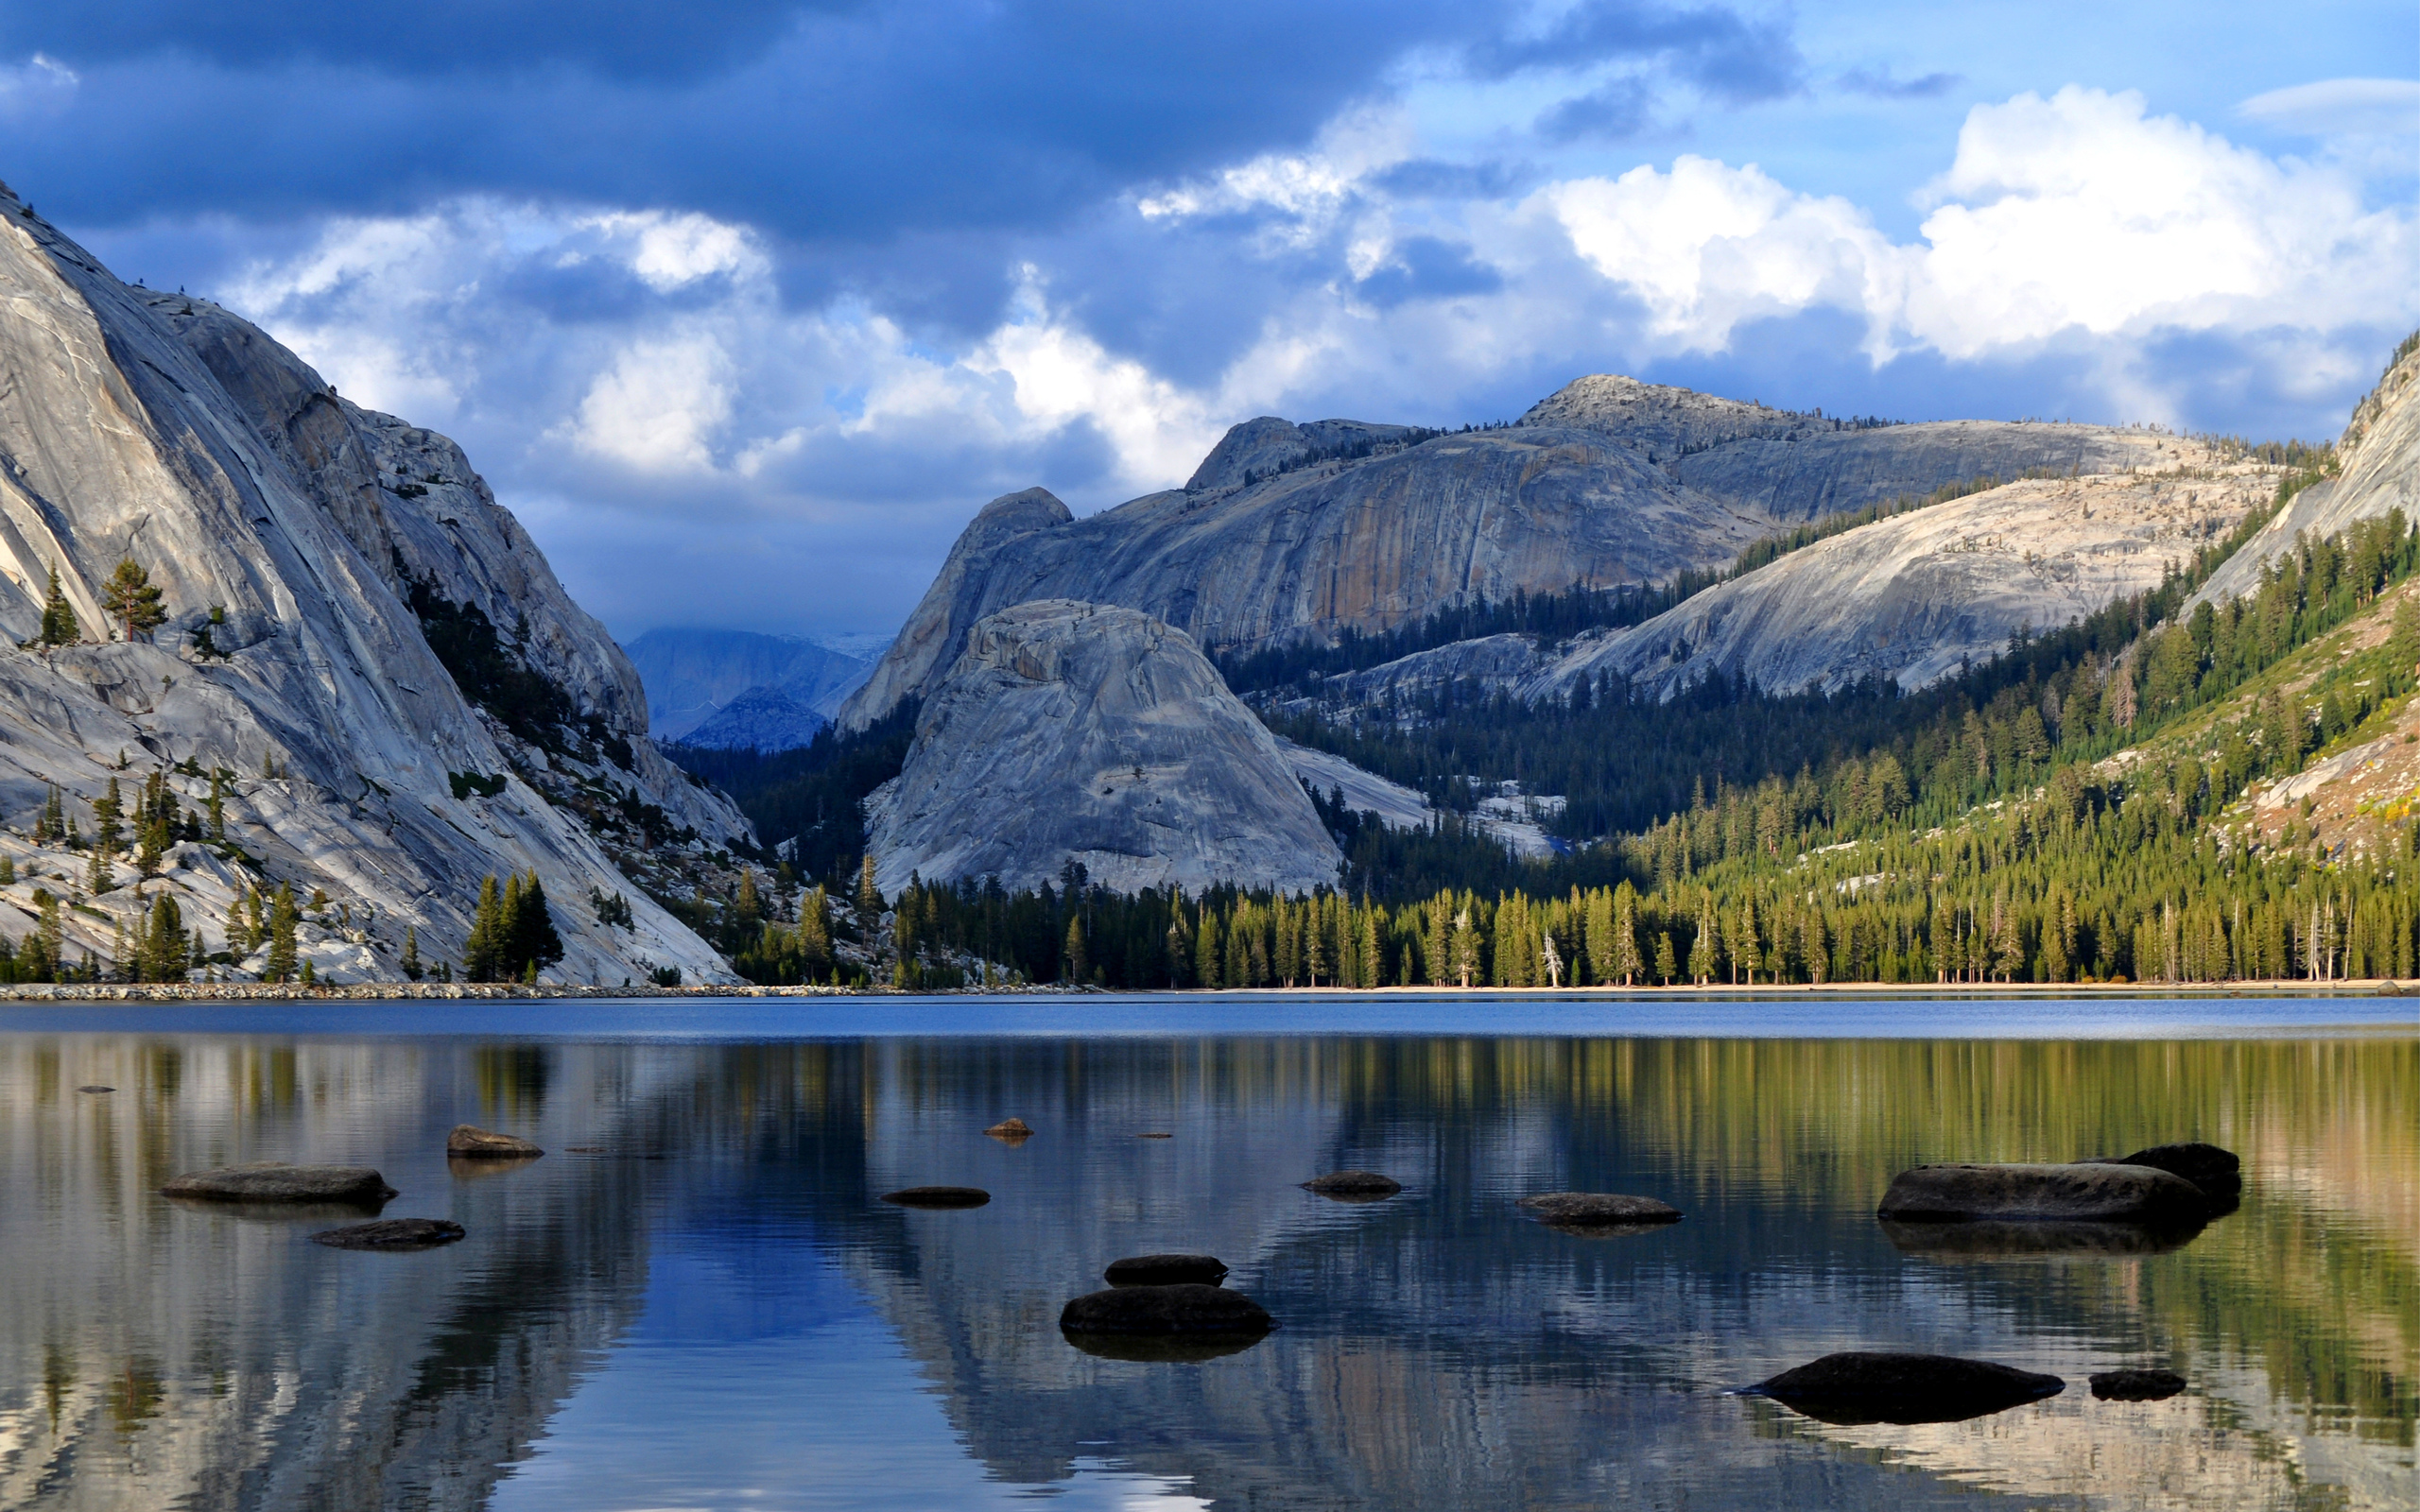 Горы, небо, лес, облака, камни  № 3240710 бесплатно